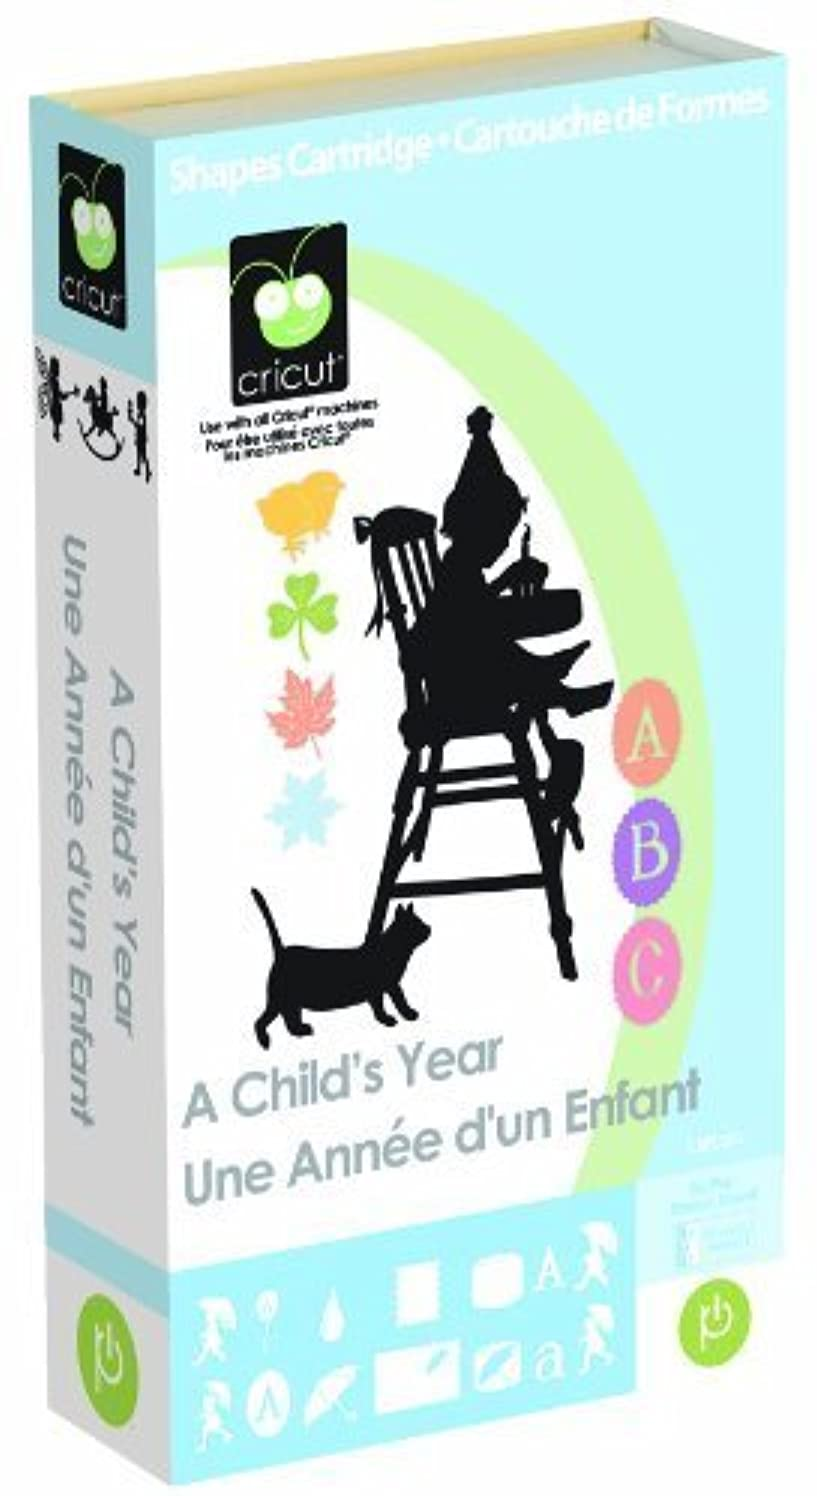 Cricut Cartridge, A Child's Year by Cricut